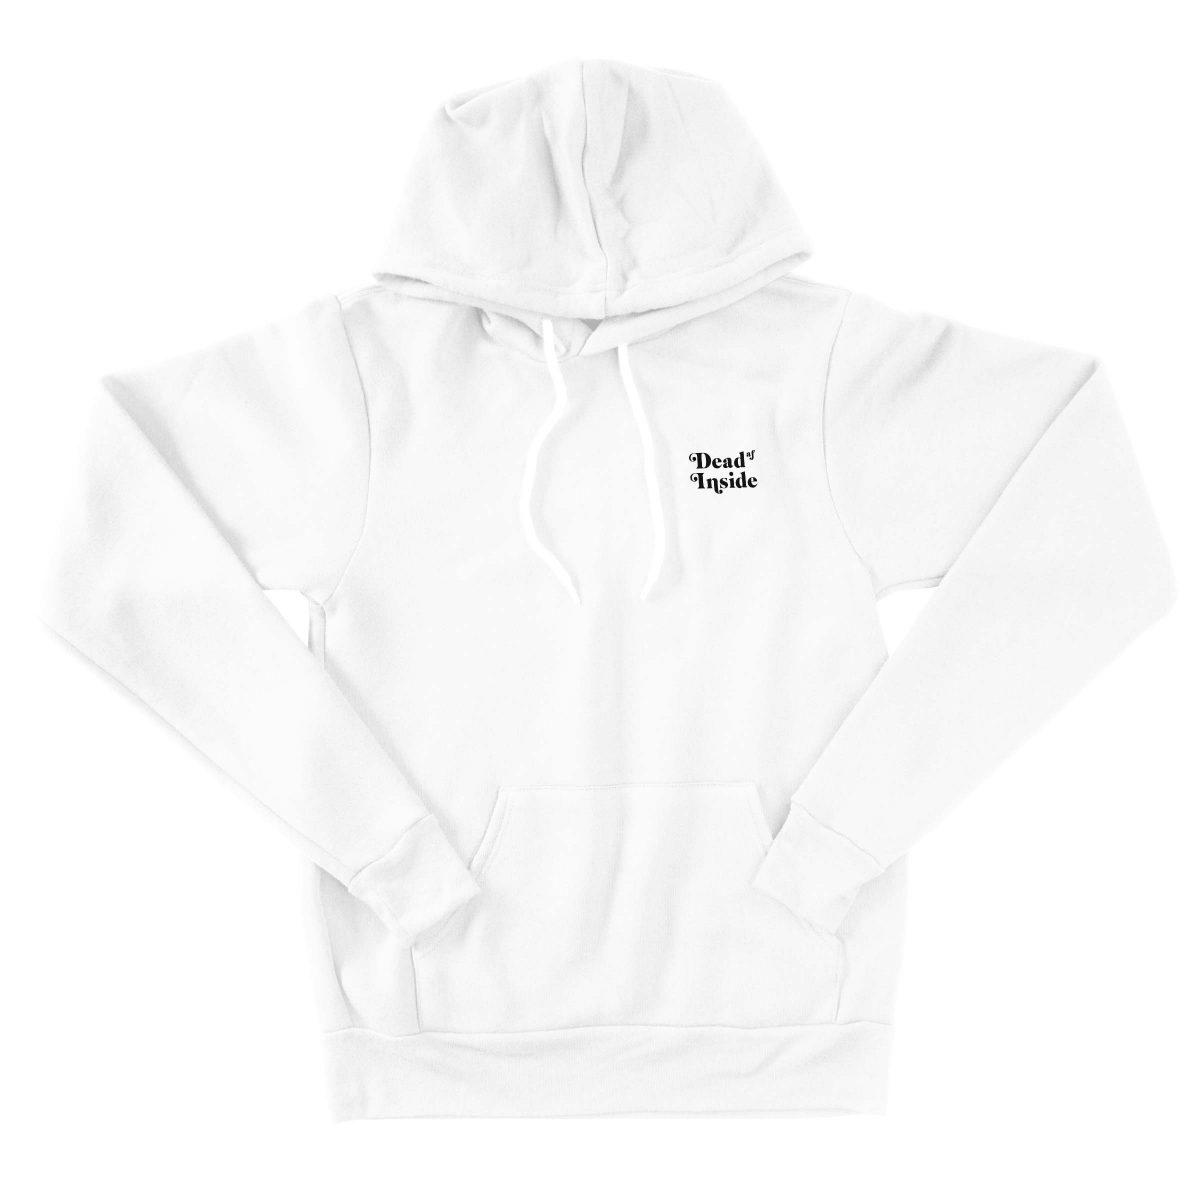 DEAD AF INSIDE triblend hoodies by kikicutt sweatshirt store